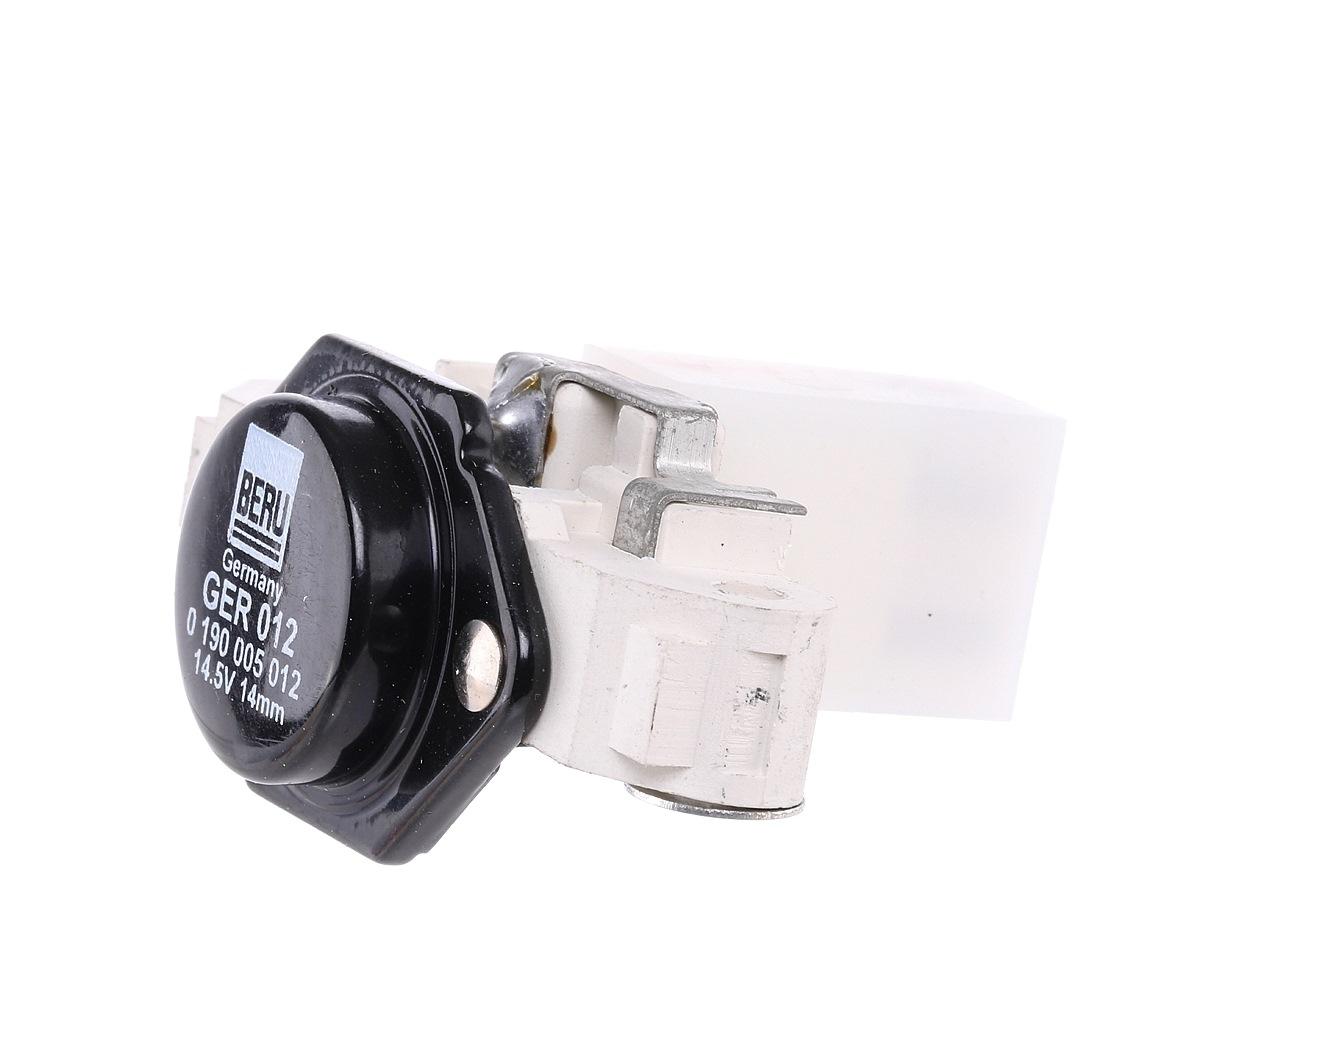 GER012 BERU Voltage: 14,5V Alternator Regulator GER012 cheap